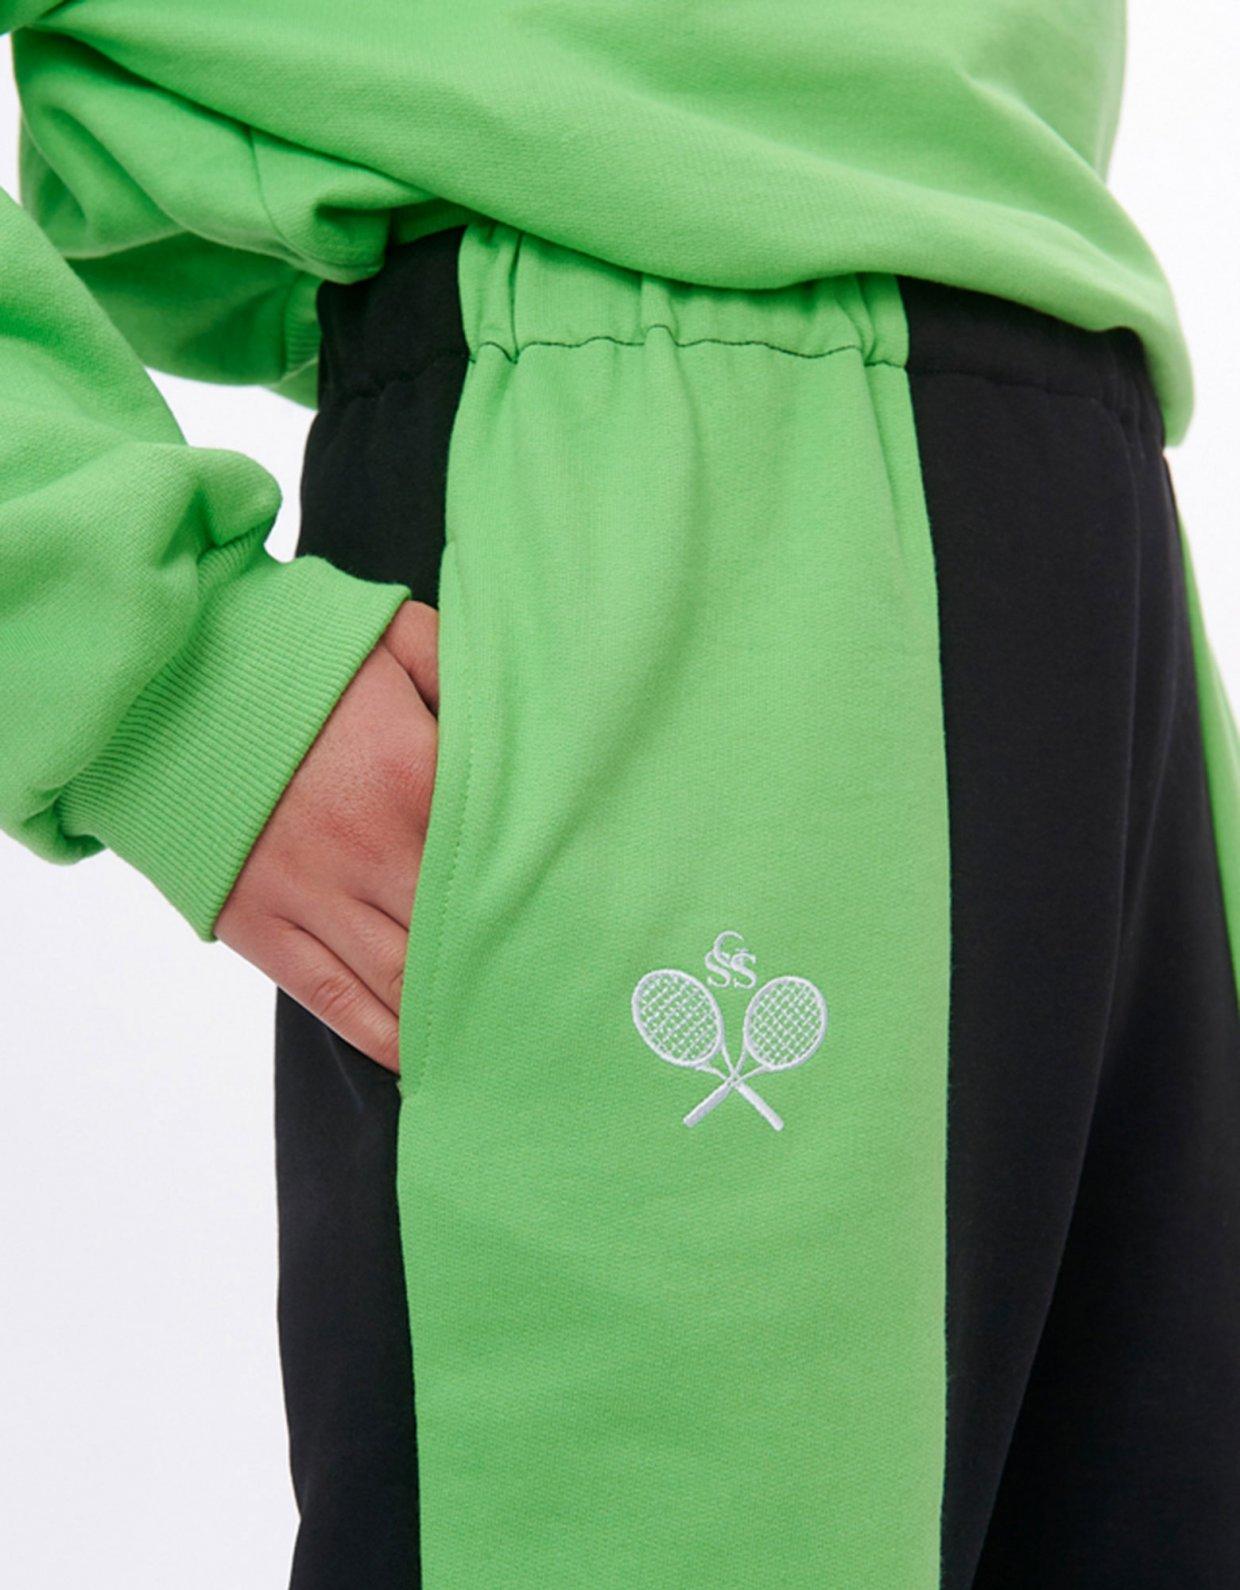 Sunset go Nadine rackets green/black track pants